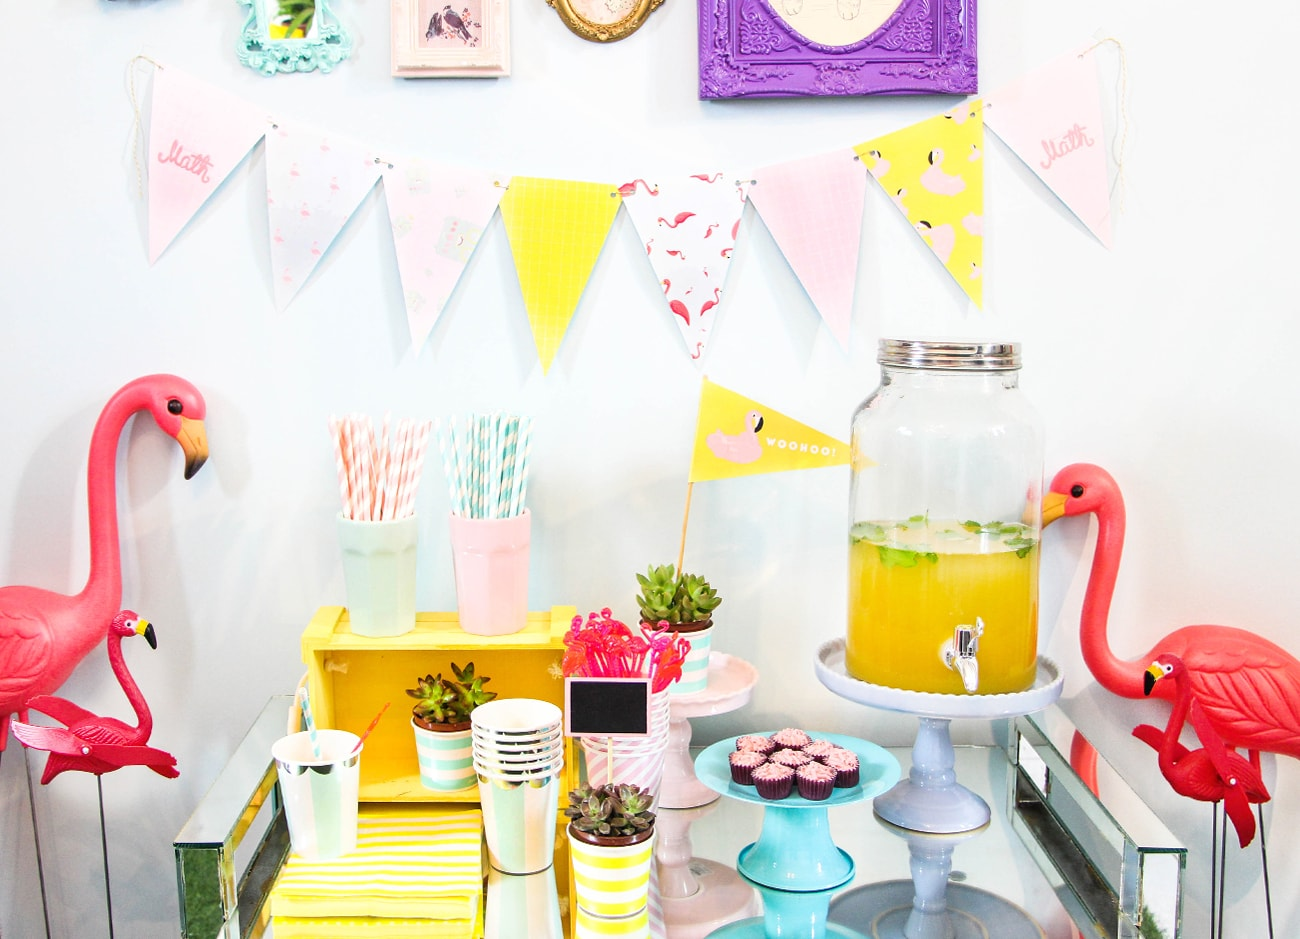 flamingo party aniversario blog do math brasilia 13-min